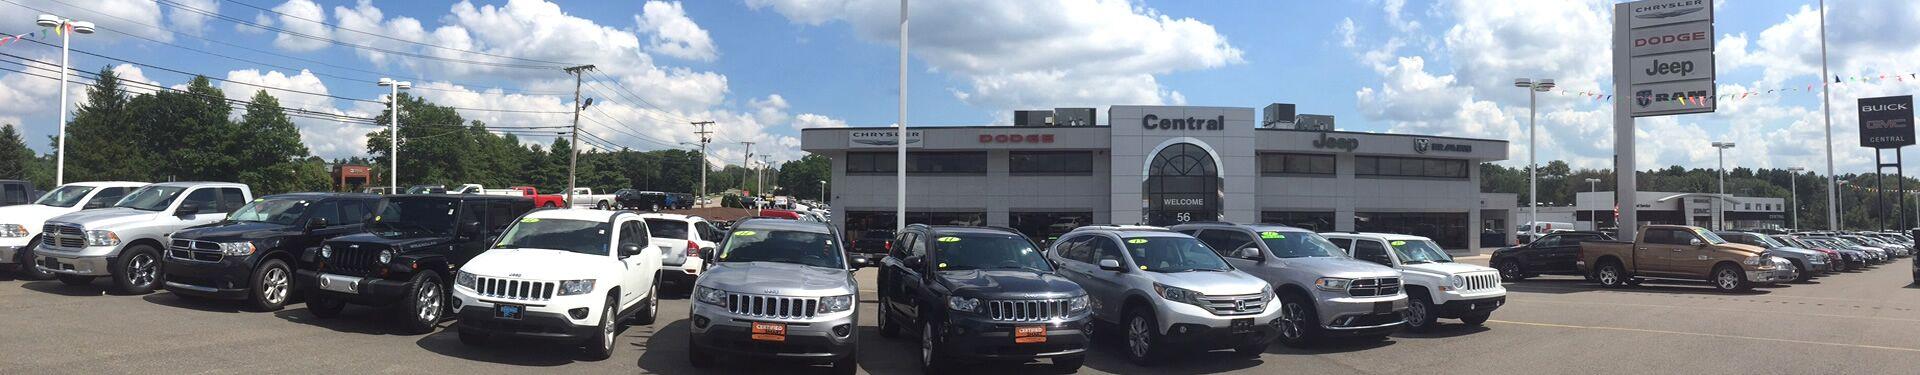 ma norwood alfa gmc romeo fiat dealerships jeep dealership mitsubishi chrysler and buick kia